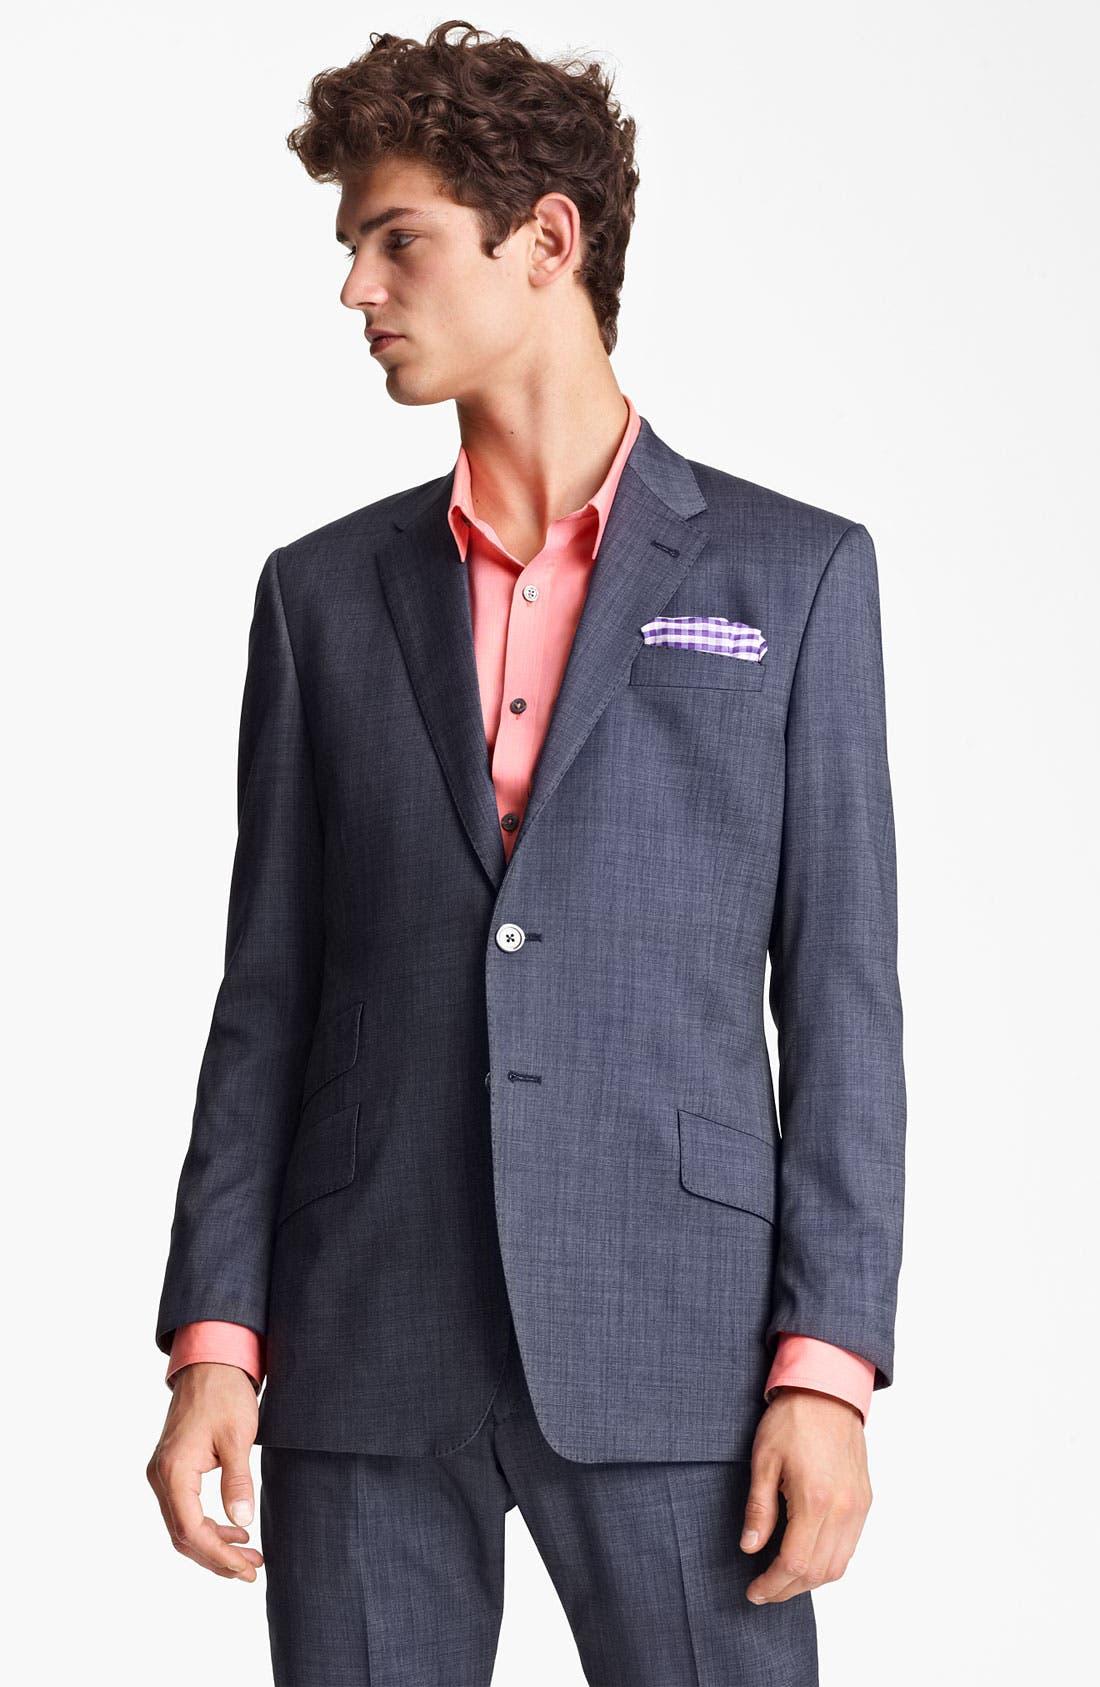 Main Image - Paul Smith London Slim Fit Wool & Cotton Suit